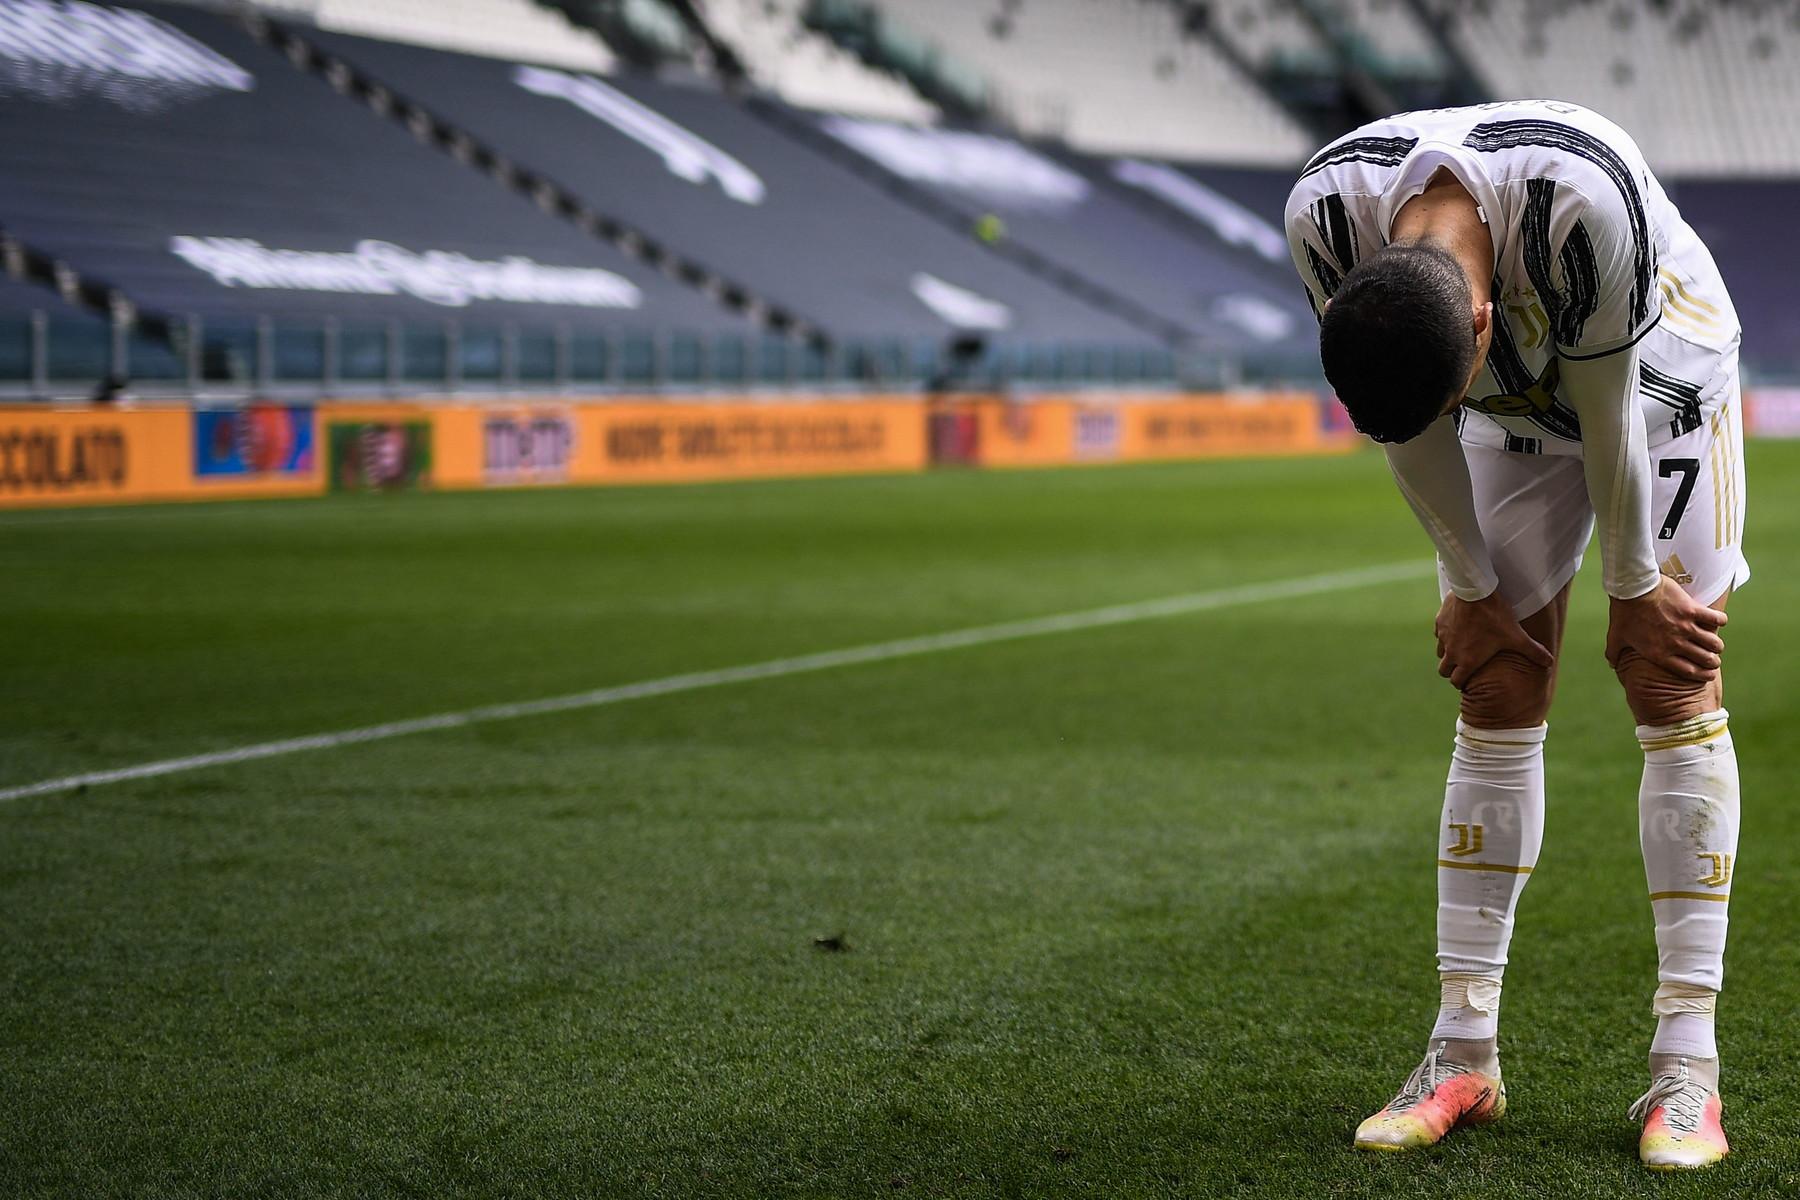 Juventus-Genoa: Cristiano Ronaldo a fine partita lancia la maglia | Foto -  Sportmediaset